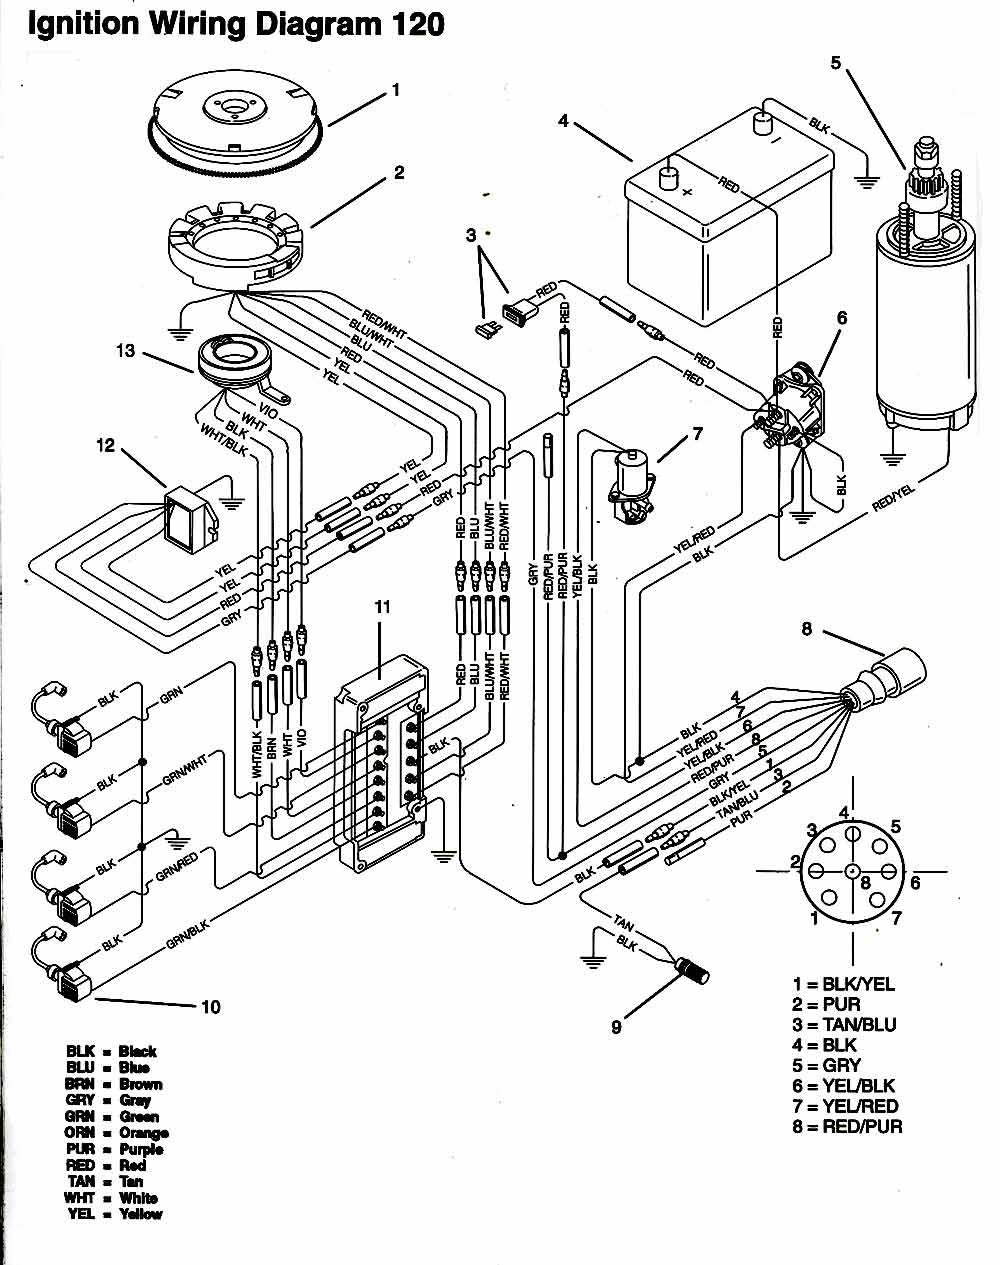 yamaha force 1 wiring diagram - wiring diagram structure loose-future -  loose-future.vinopoggioamorelli.it  vinopoggioamorelli.it